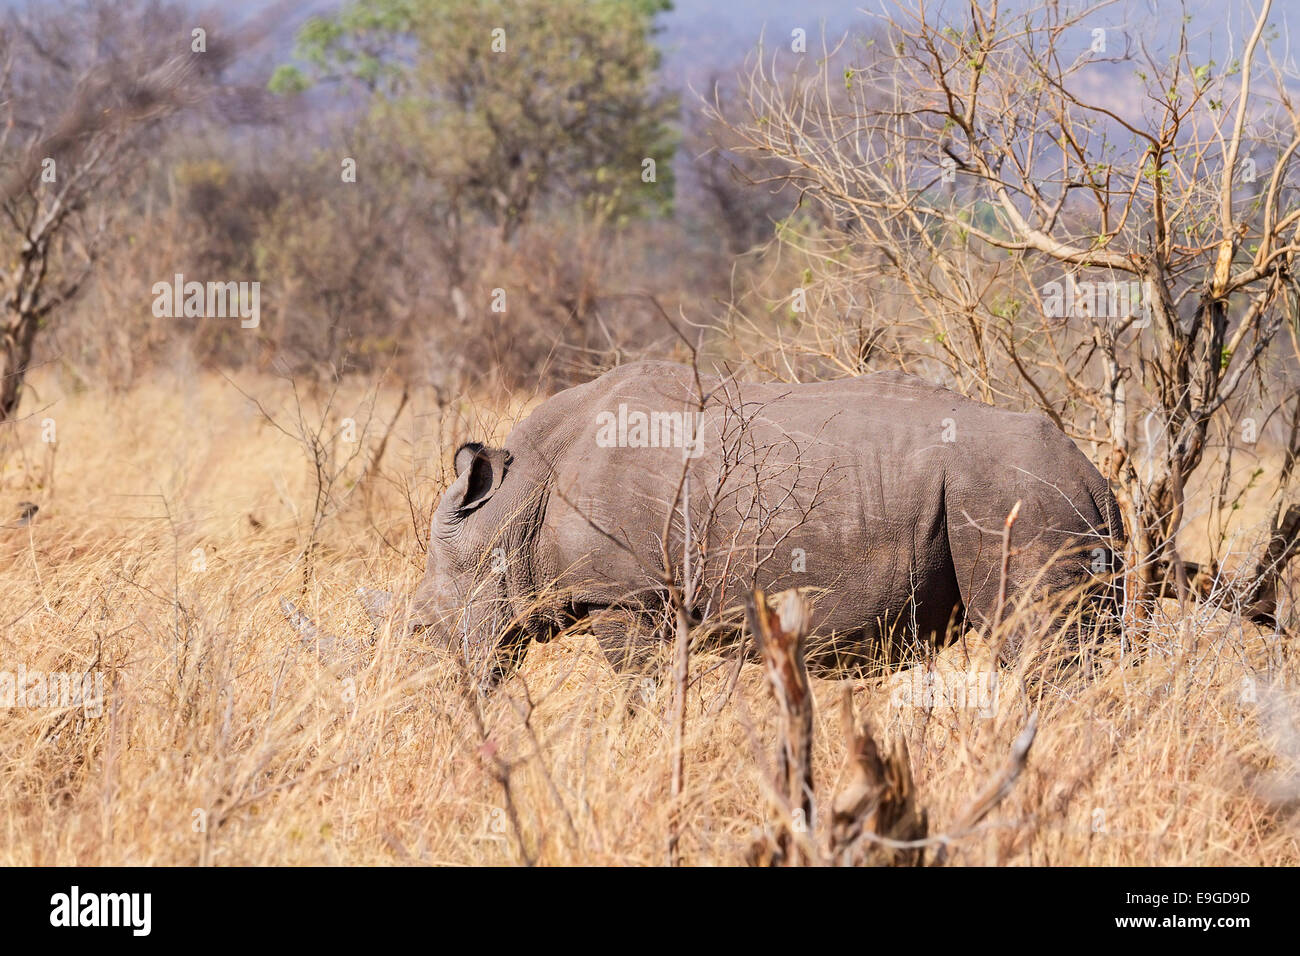 White Rhinoceros (Ceratotherium simum) feeding in shrubland in Mosi-oa-Tunya National Park near Victoria Falls, - Stock Image